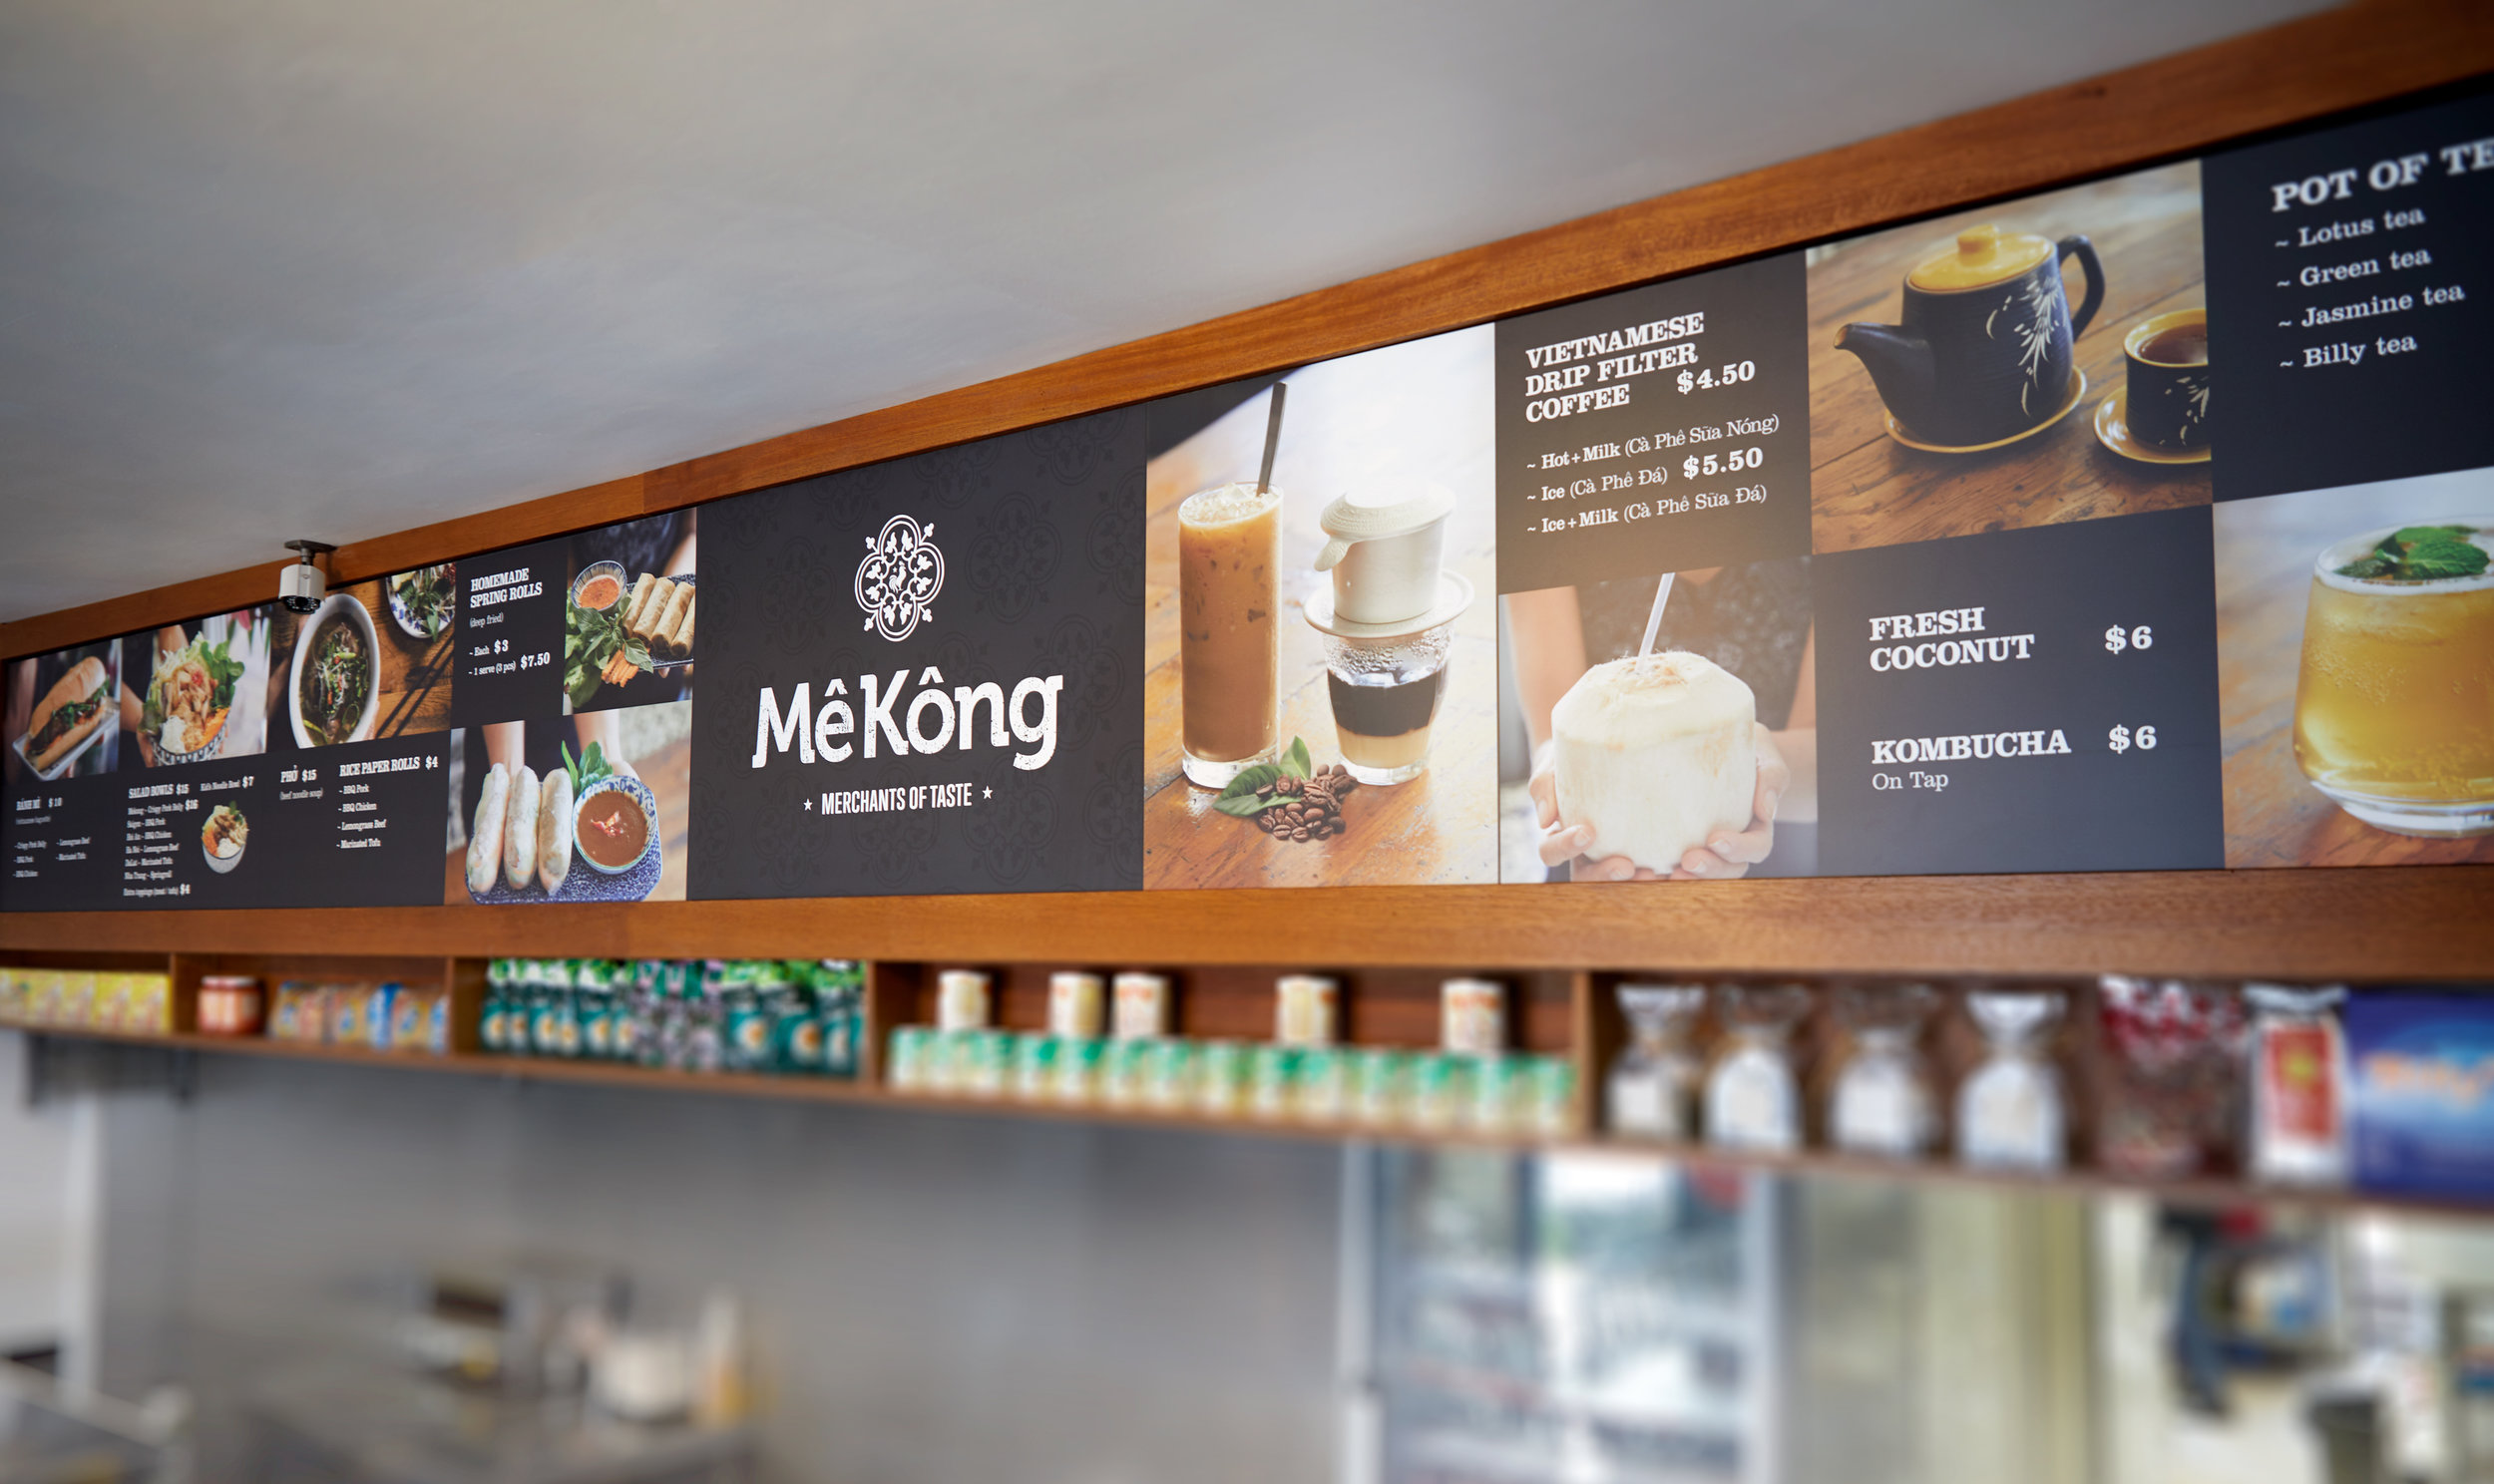 Mekong Vietnamese Restaurant Menu Board